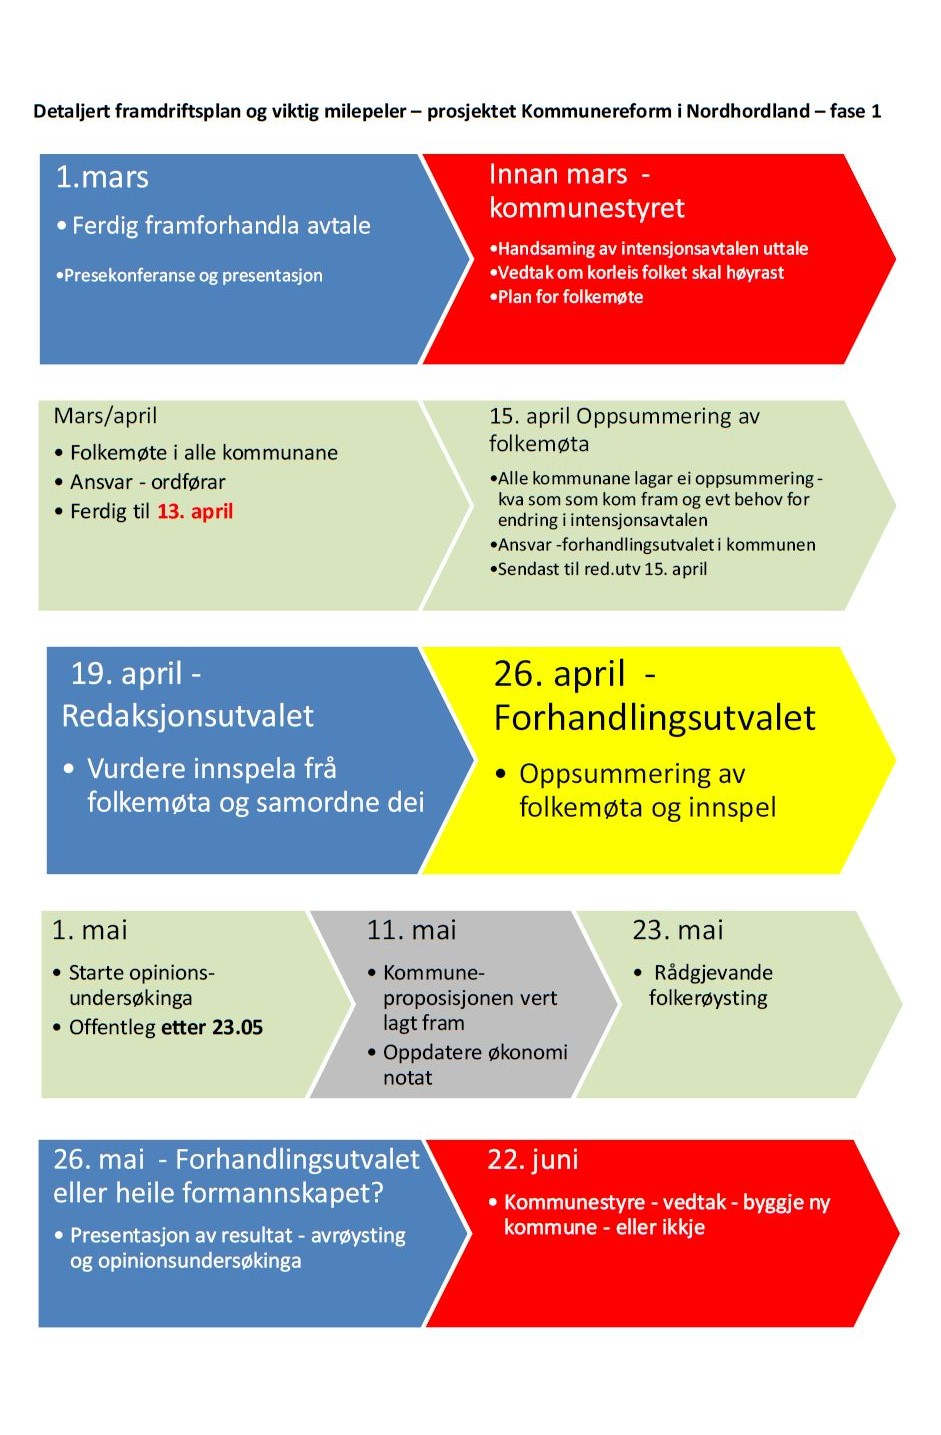 Kommunereforma - framdriftsplan fase 1.JPG